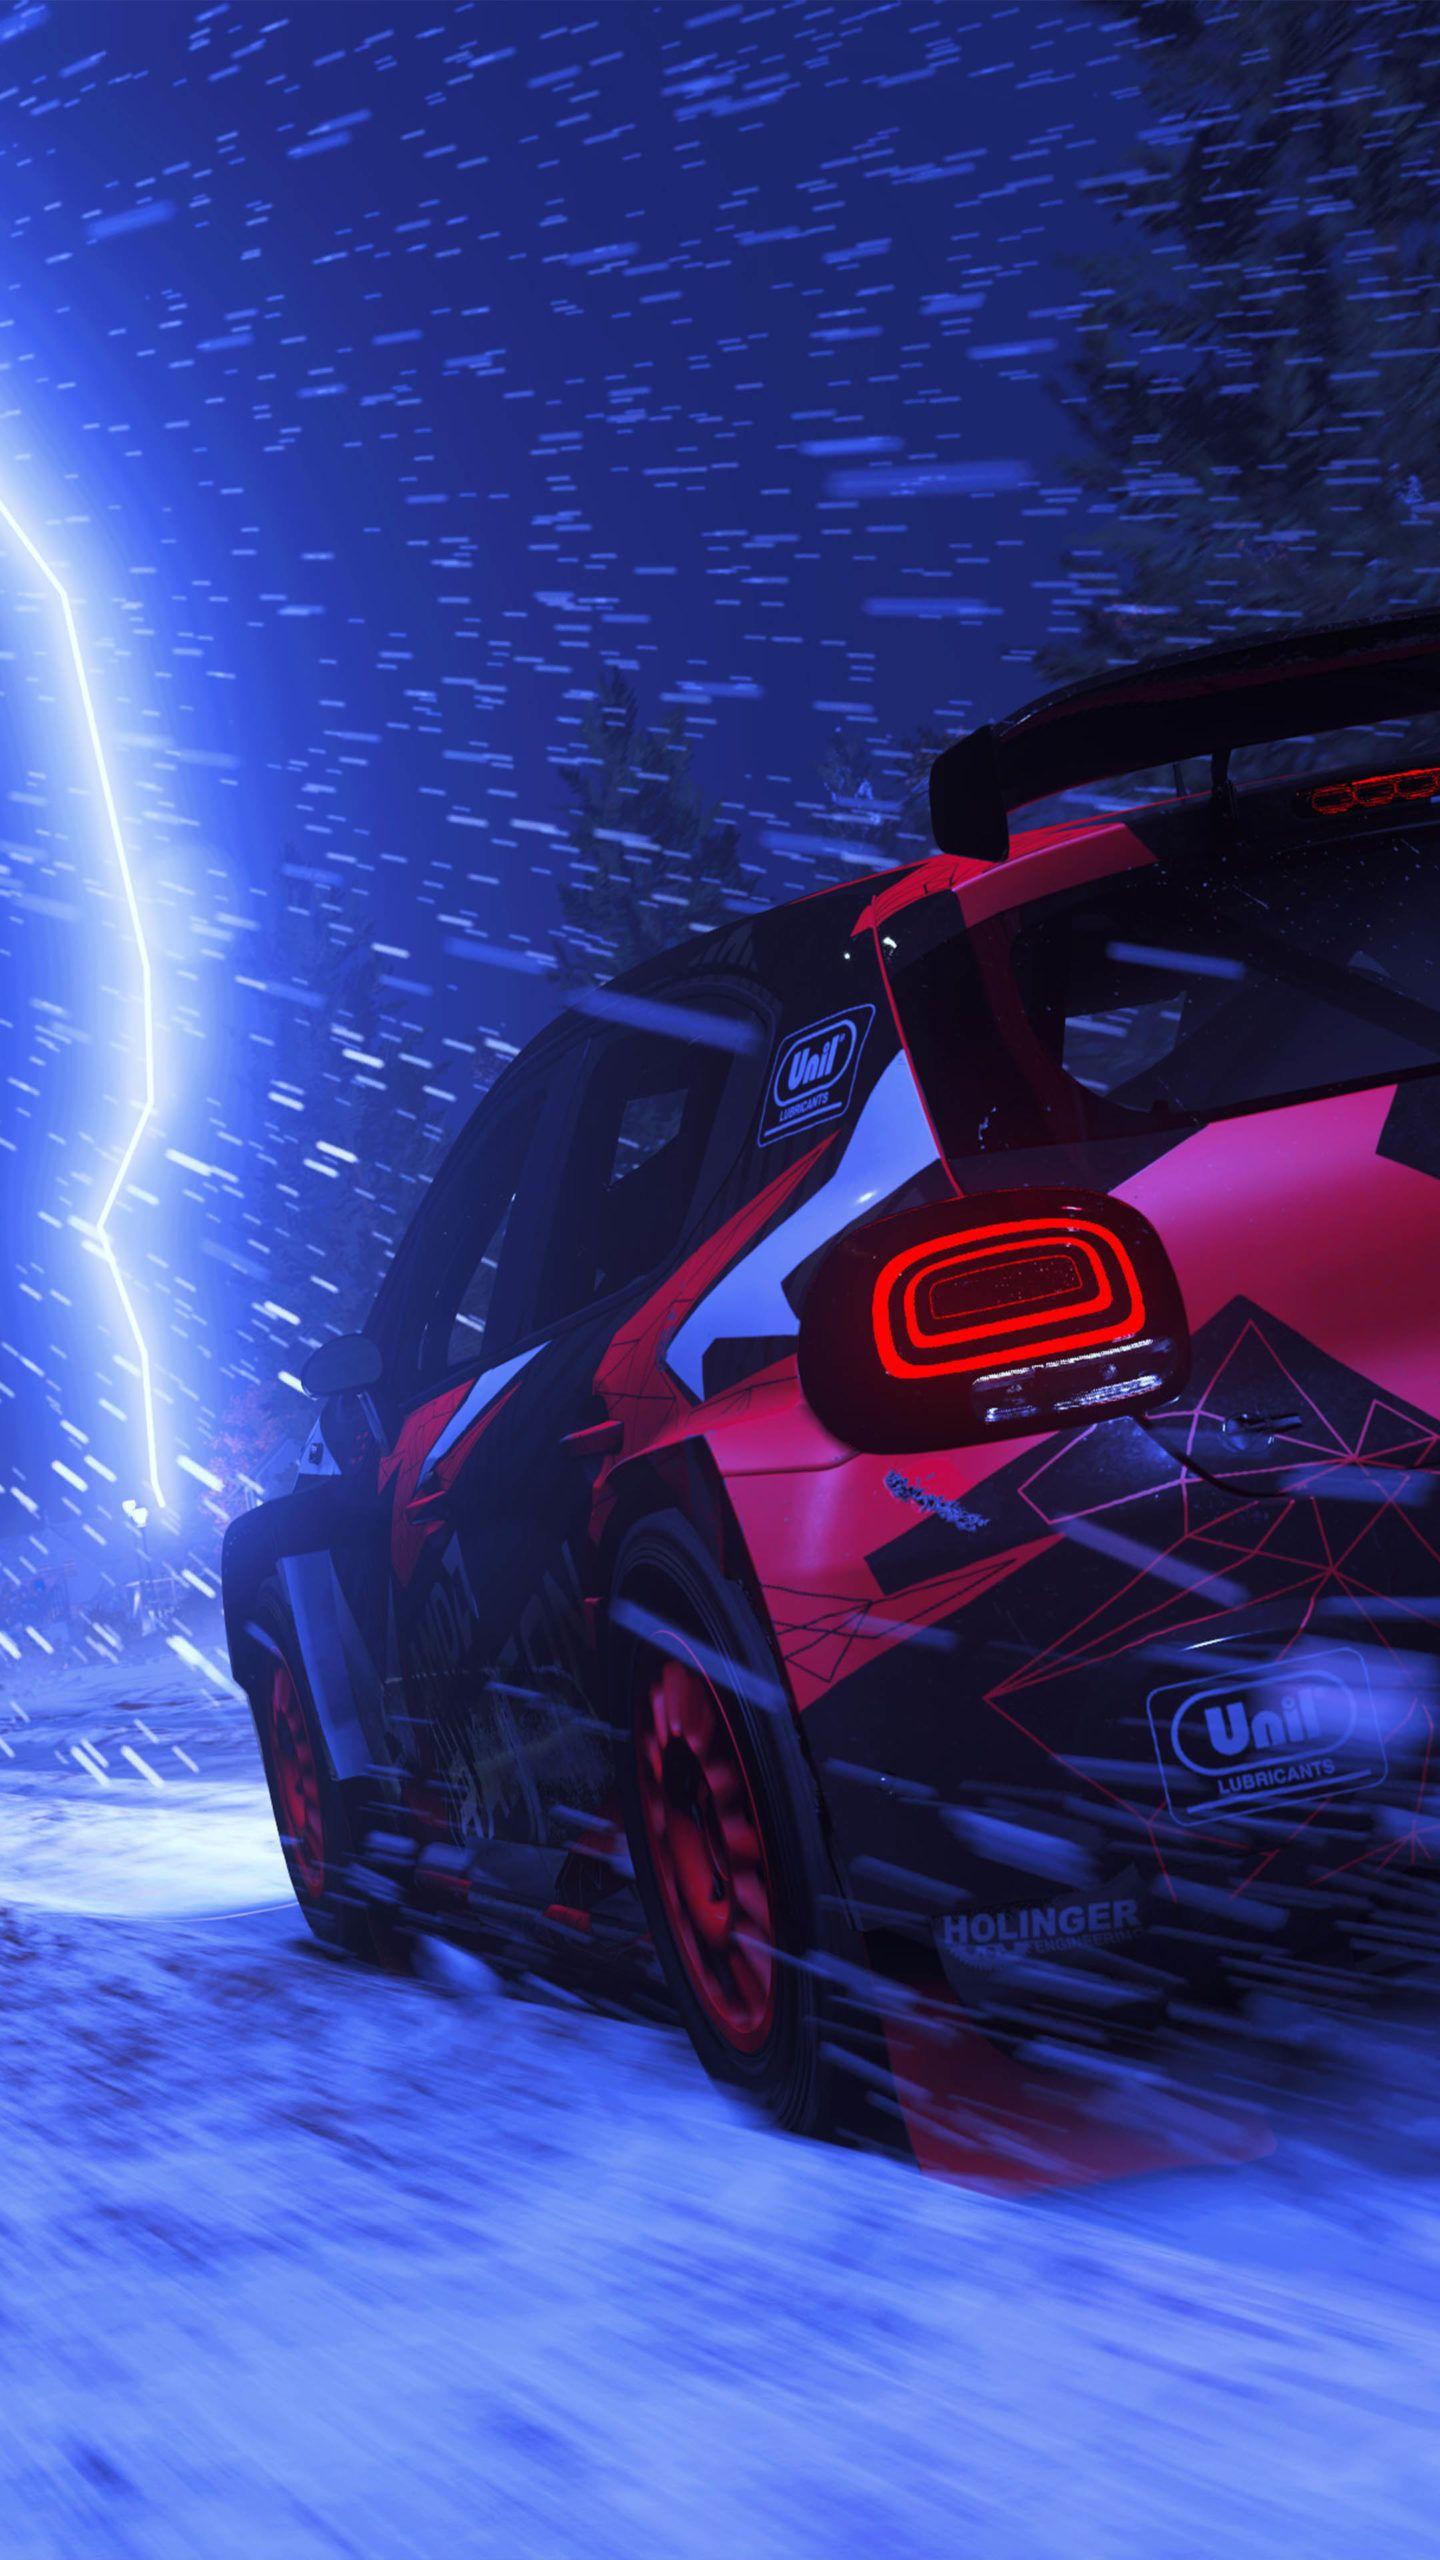 Dirt 5 Race Lightening 4k Ultra Hd Mobile Wallpaper In 2021 Futuristic Cars Design Sports Car Wallpaper Car Wallpapers